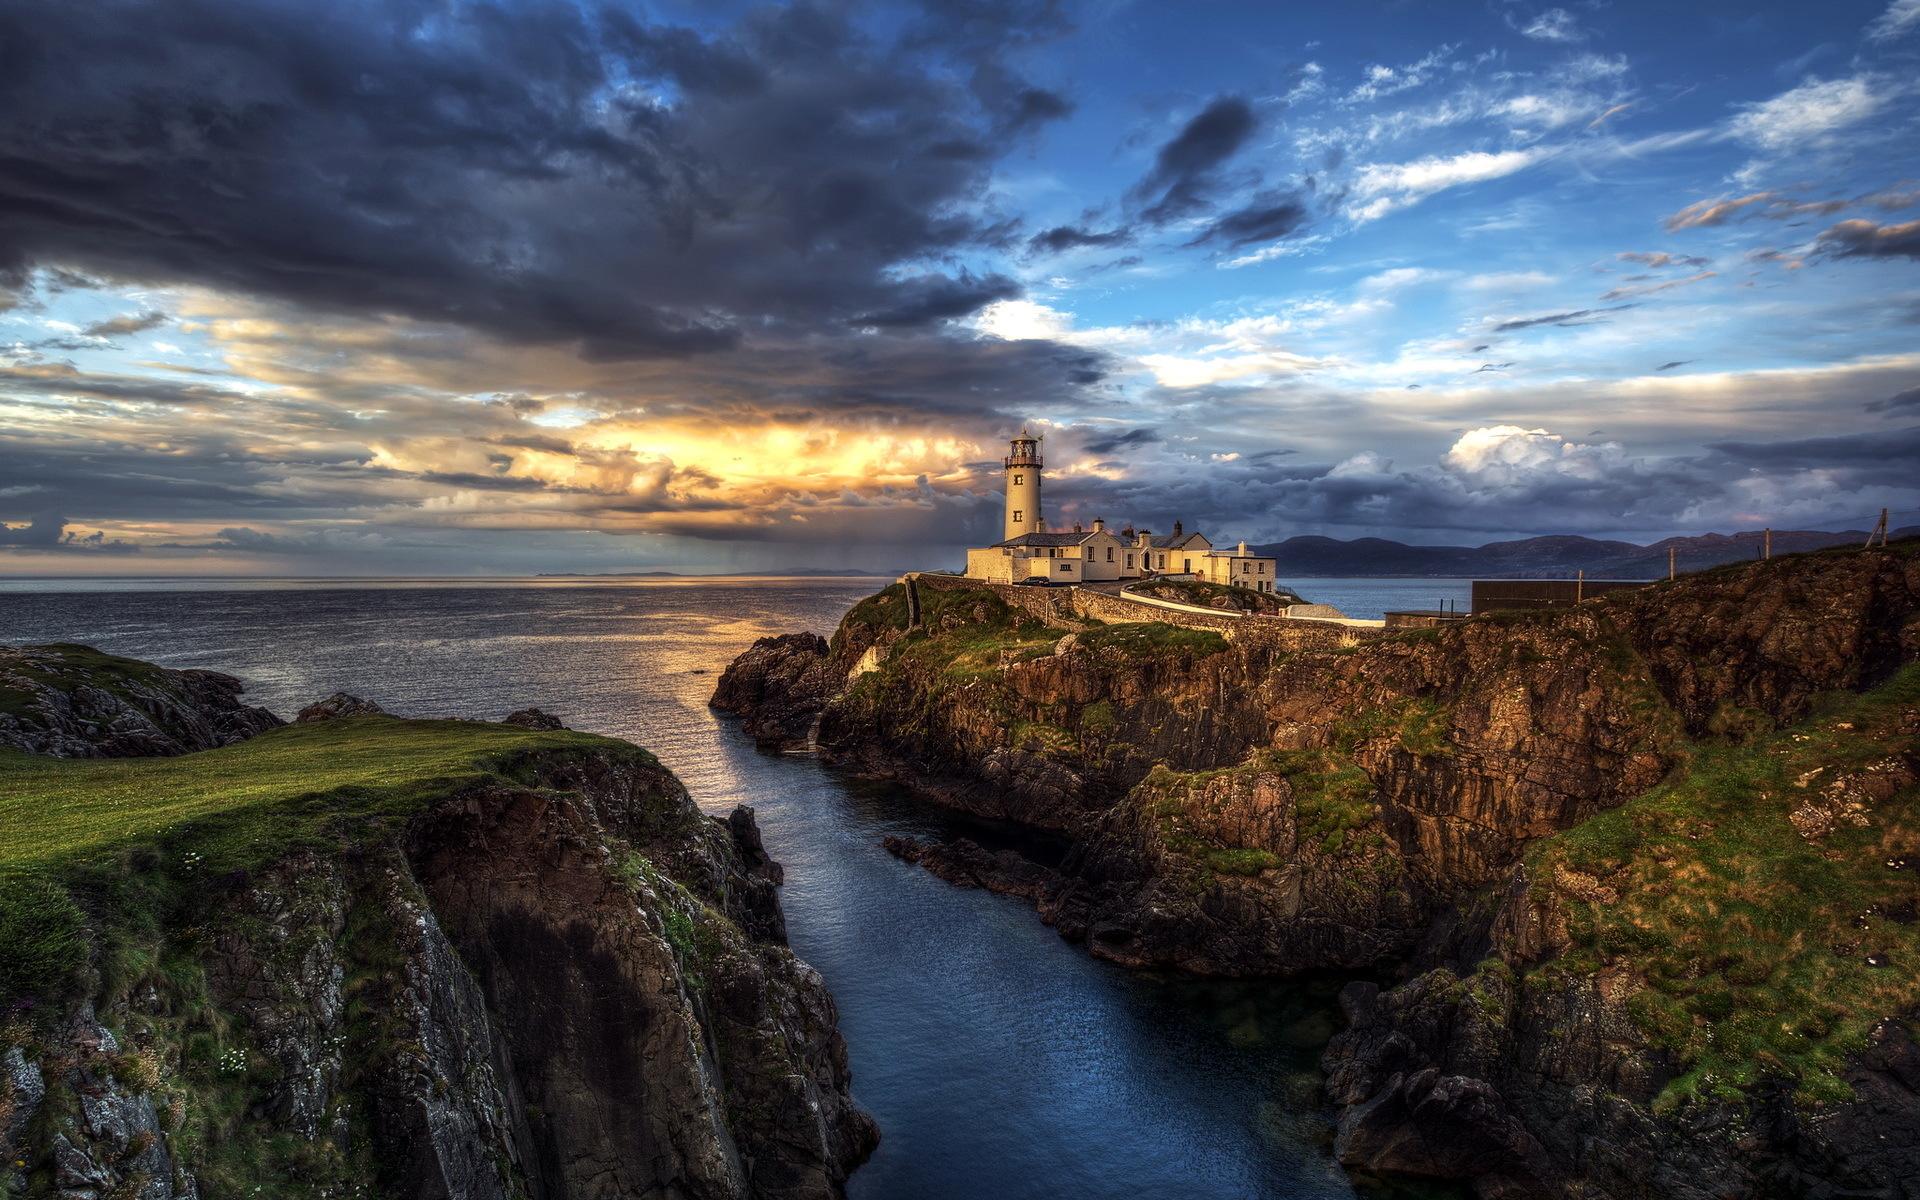 ireland seascape lighthouse ocean wallpaper background 1920x1200